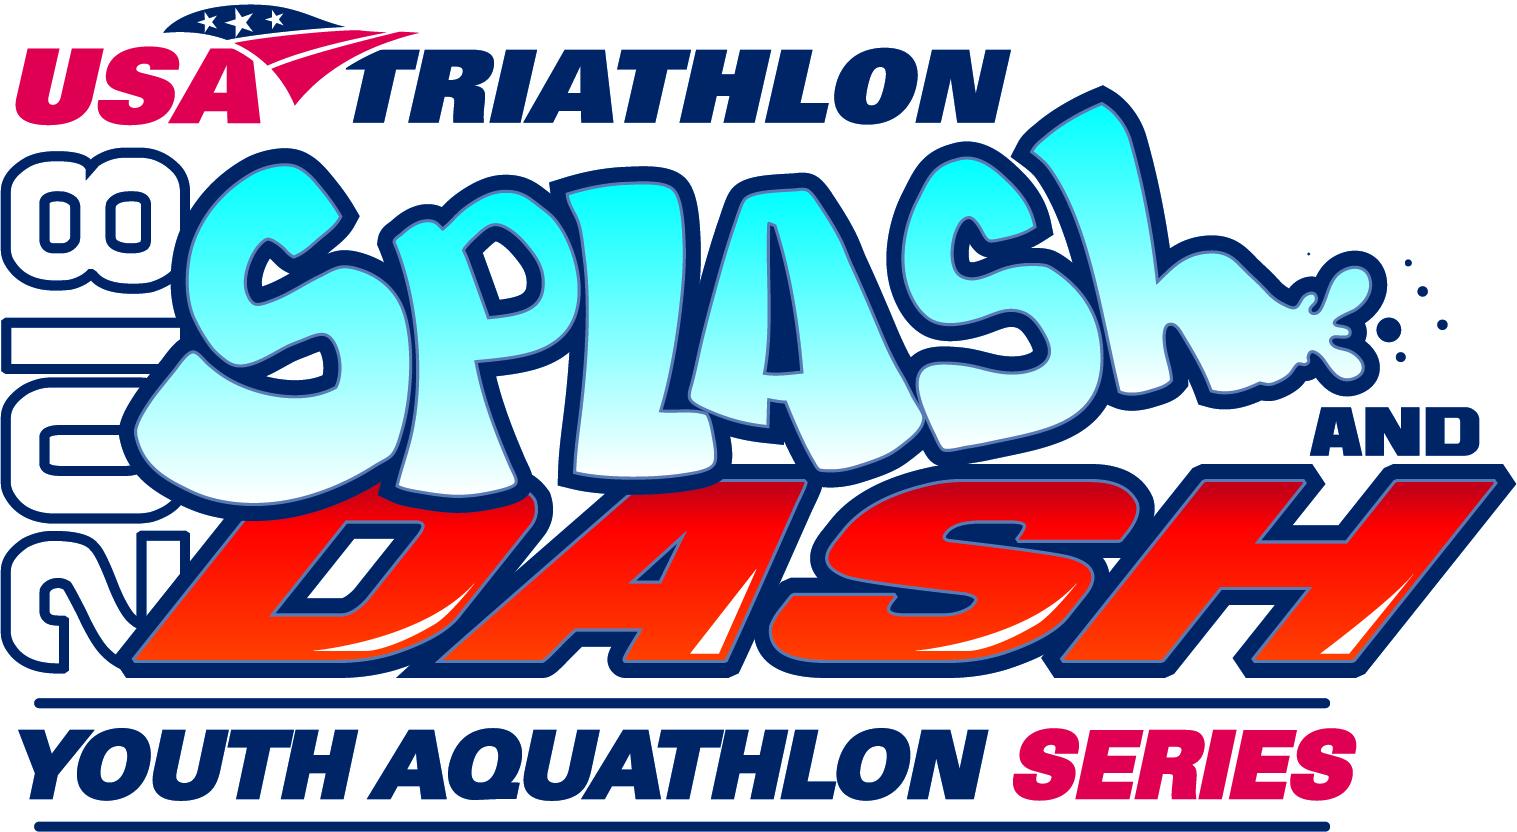 Splash_Dash_2018.jpg